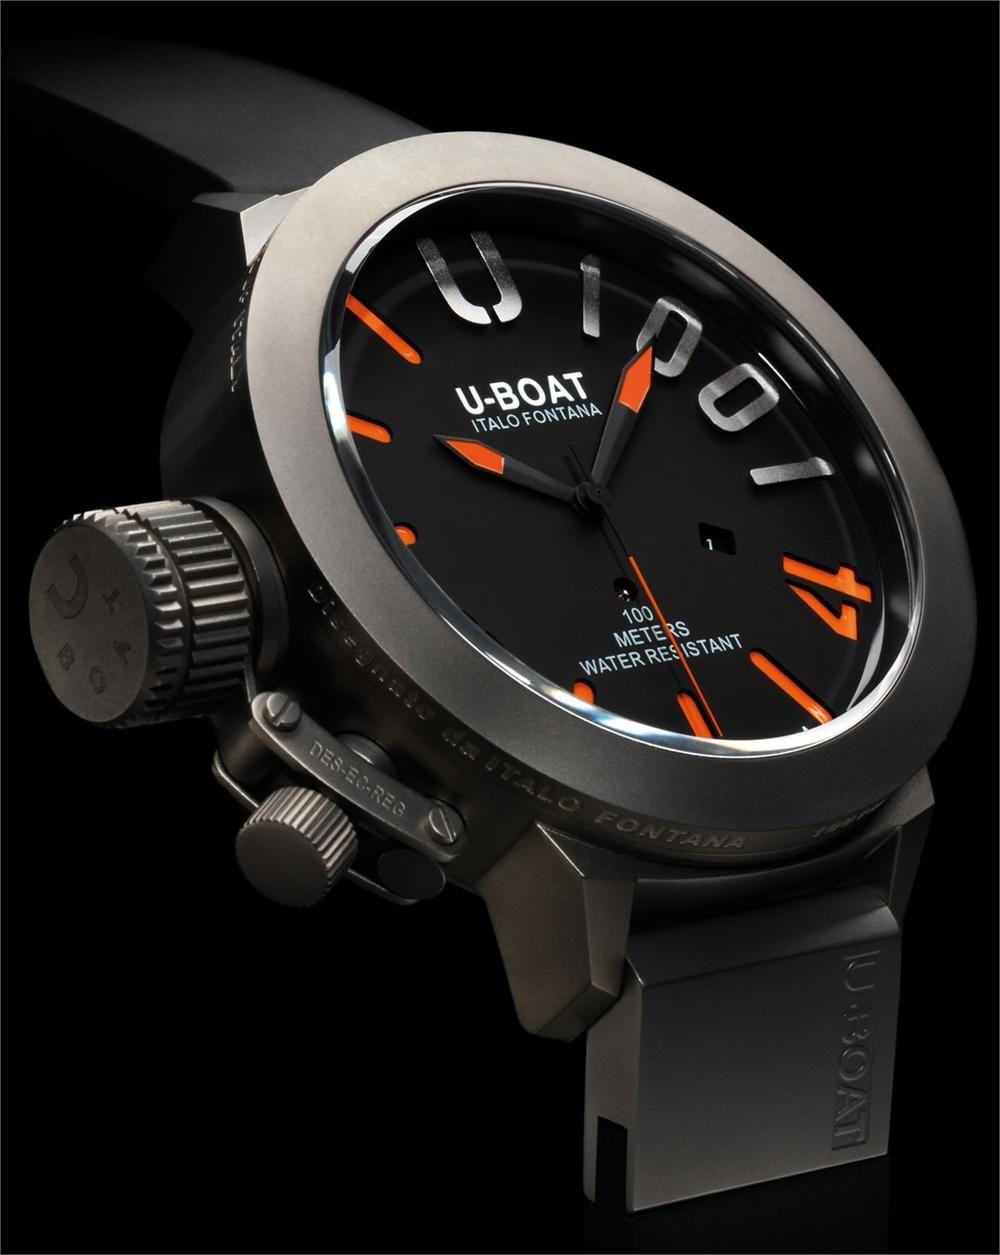 60935247ca9 U-Boat Classico U-1001 Titanium Orange Limited Edition watch